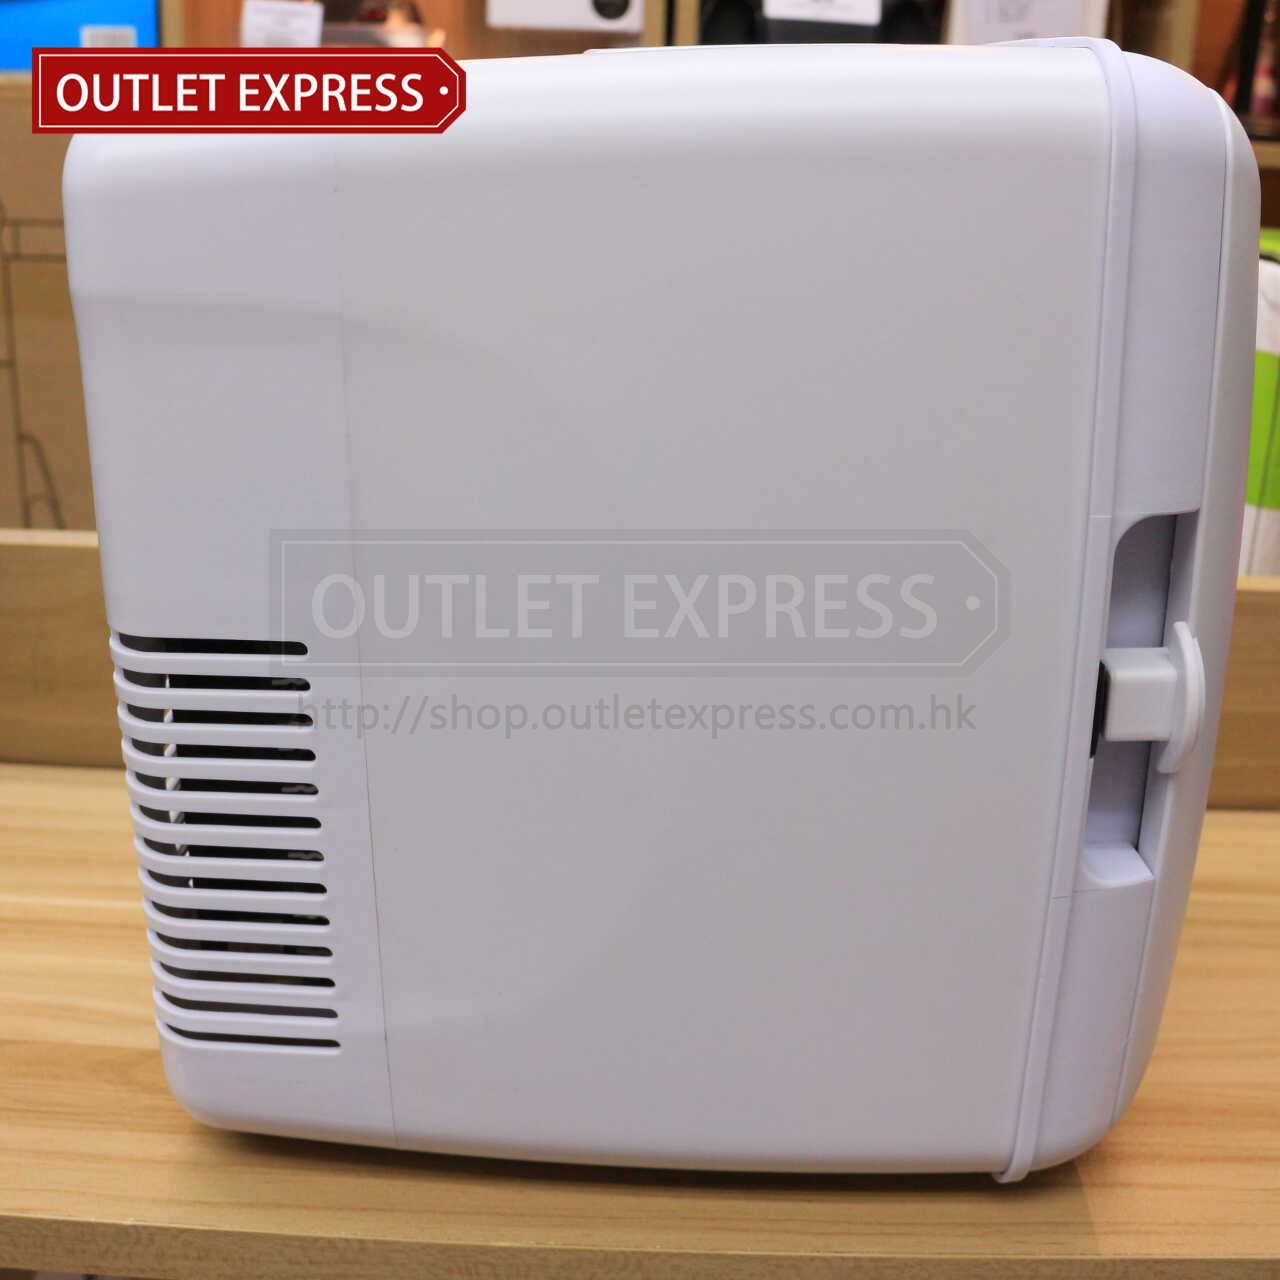 4L 冷暖兩用迷你小雪櫃 | 可車載或家用 側面圖- Outlet Express HK生活百貨城實拍相片